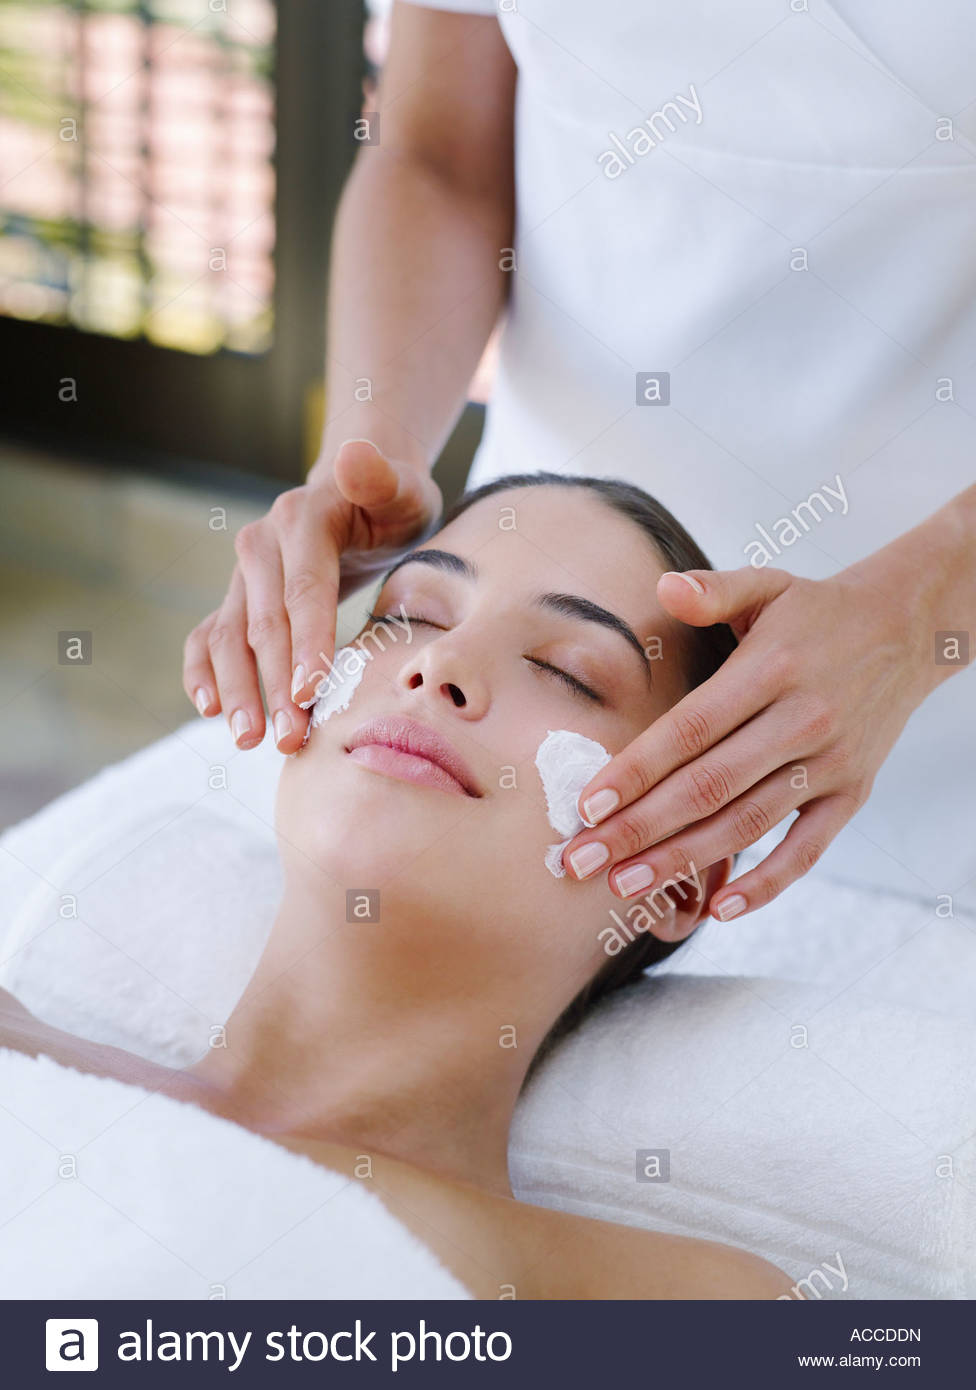 Woman receiving a facial treatment - Stock Image